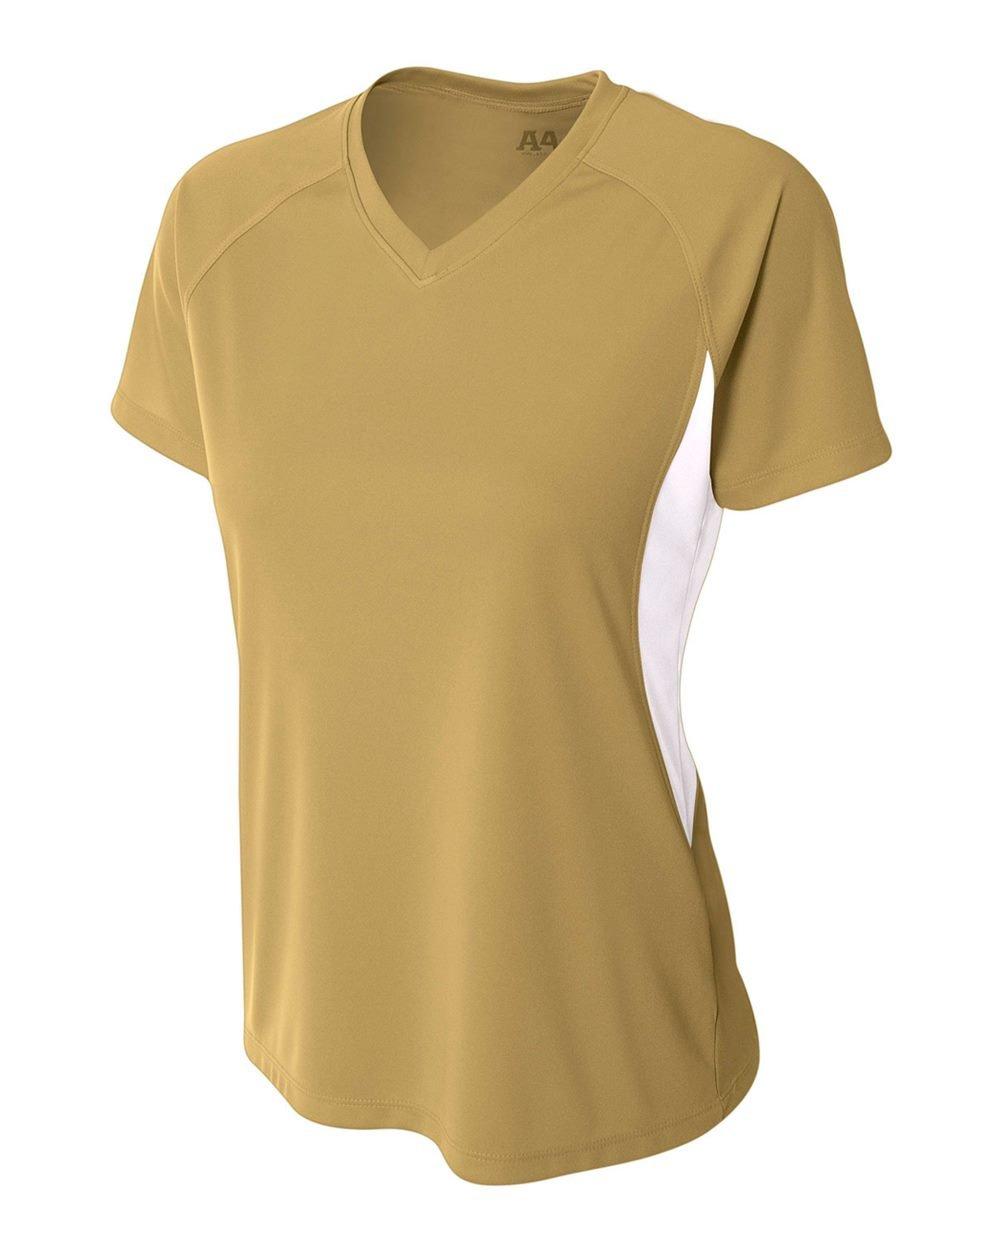 Women 's Athletic Moisture Wicking Vネック2色パフォーマンスシャツ/ Uniform (すべてのスポーツ:サッカー、ソフトボール、バレーボール。。。) B00SW5DDC2 Medium Vegas Gold (White Contrast Side Block) Vegas Gold (White Contrast Side Block) Medium